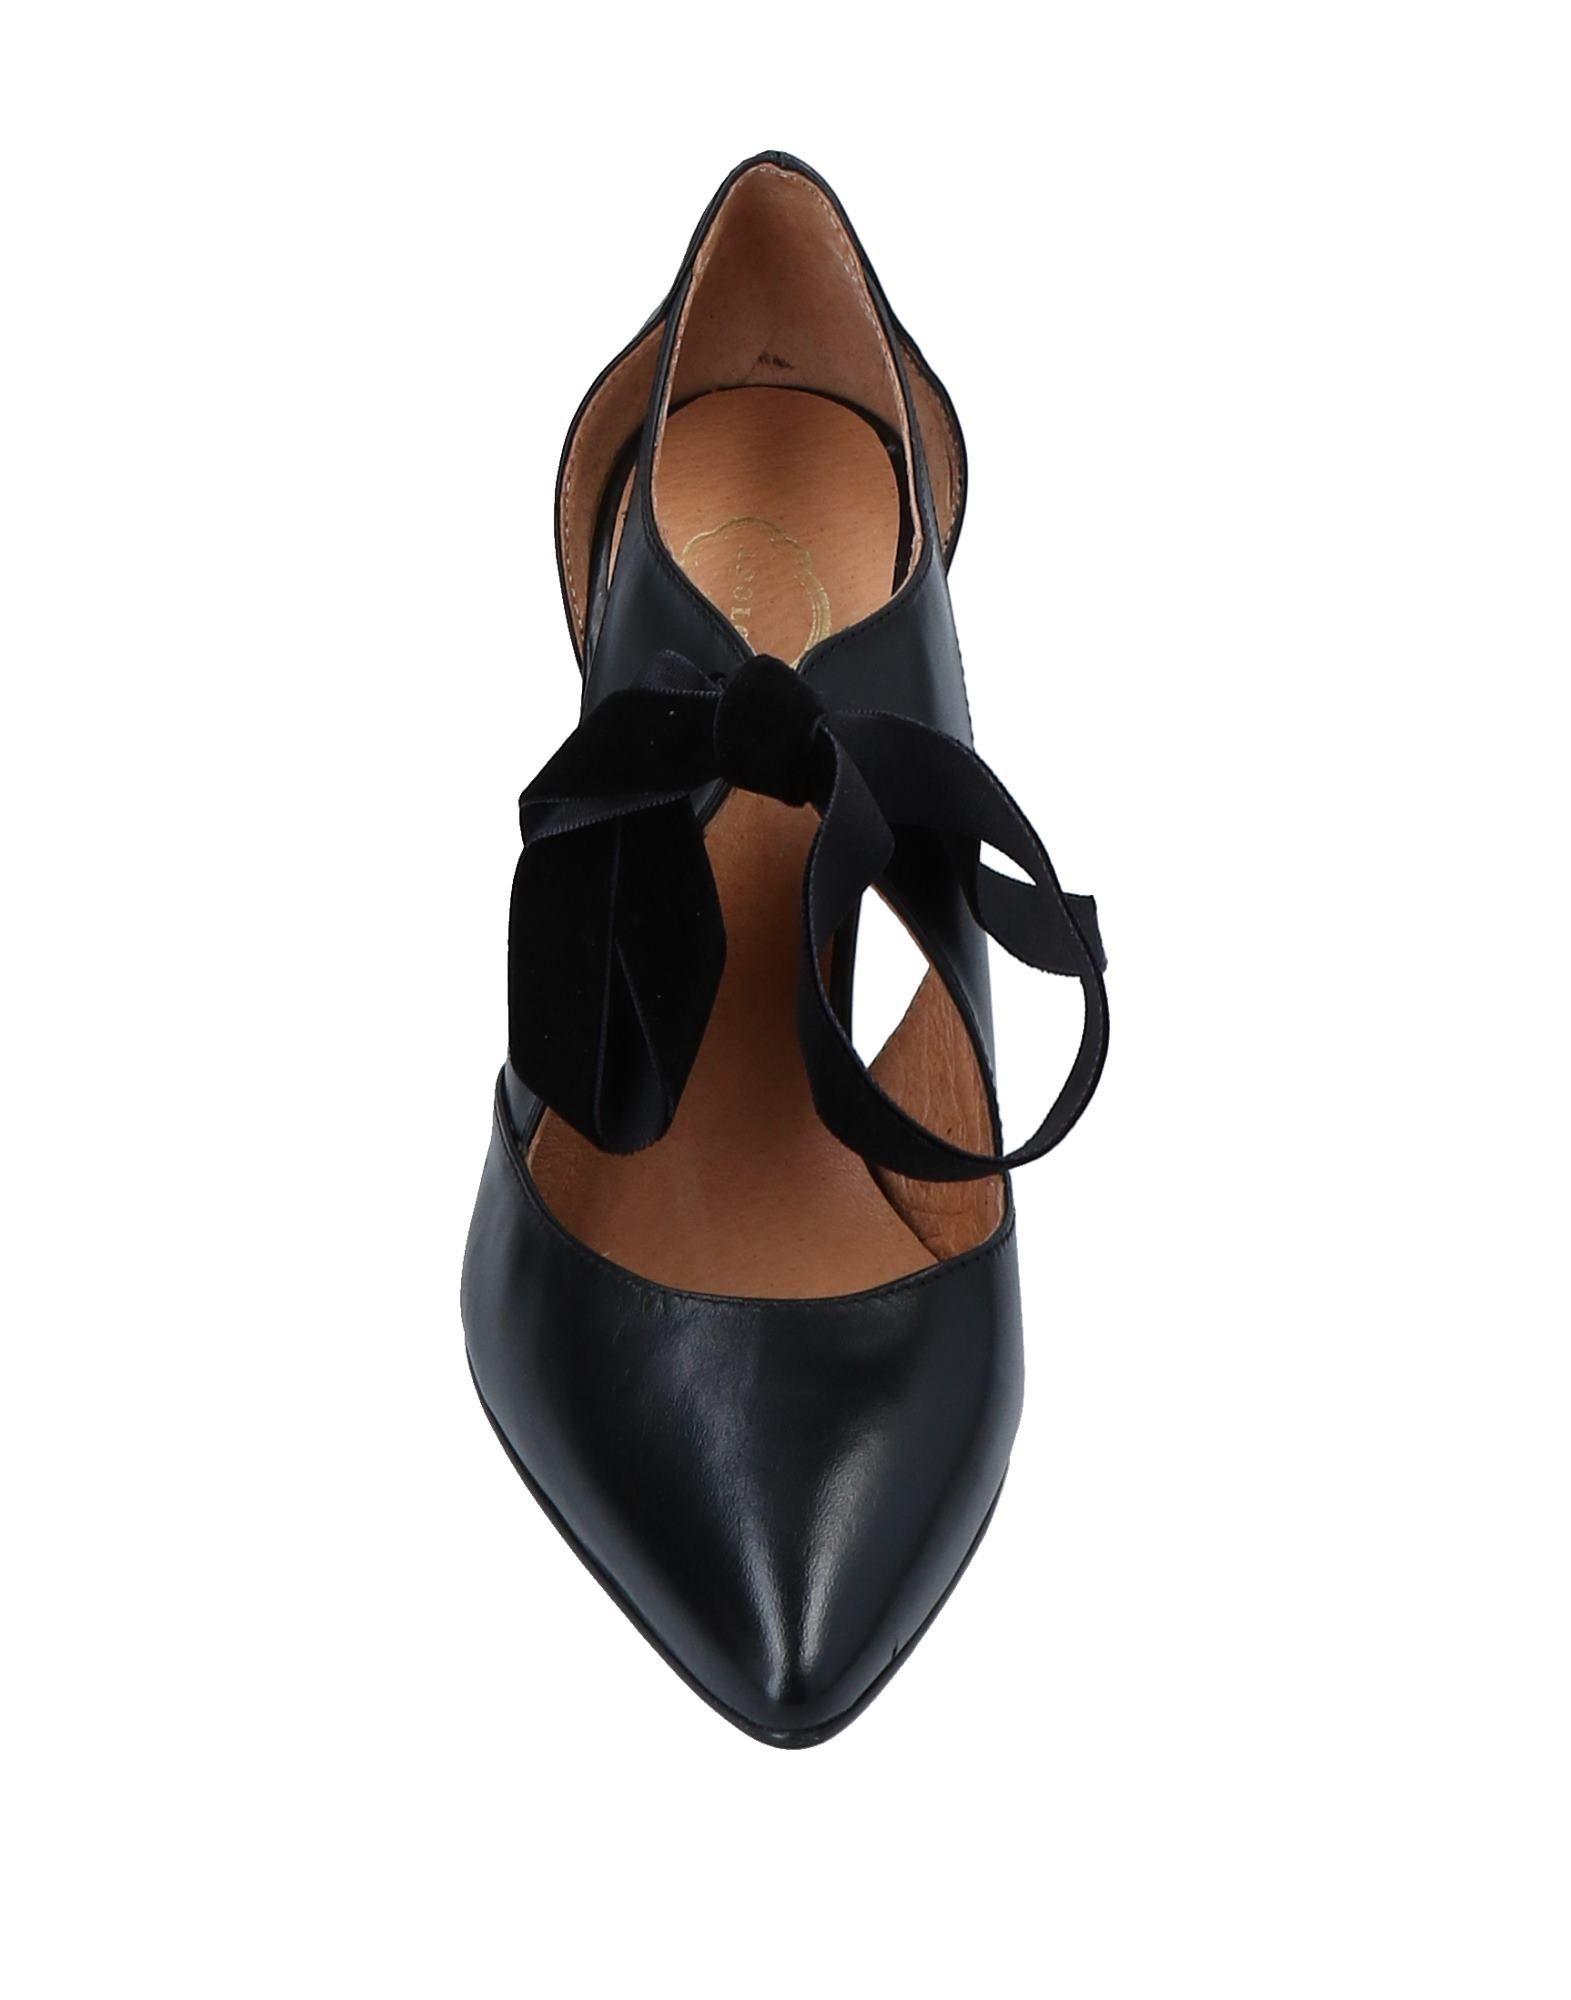 Stilvolle billige Pumps Schuhe Apologie Pumps billige Damen  11548242DV 1b26a6